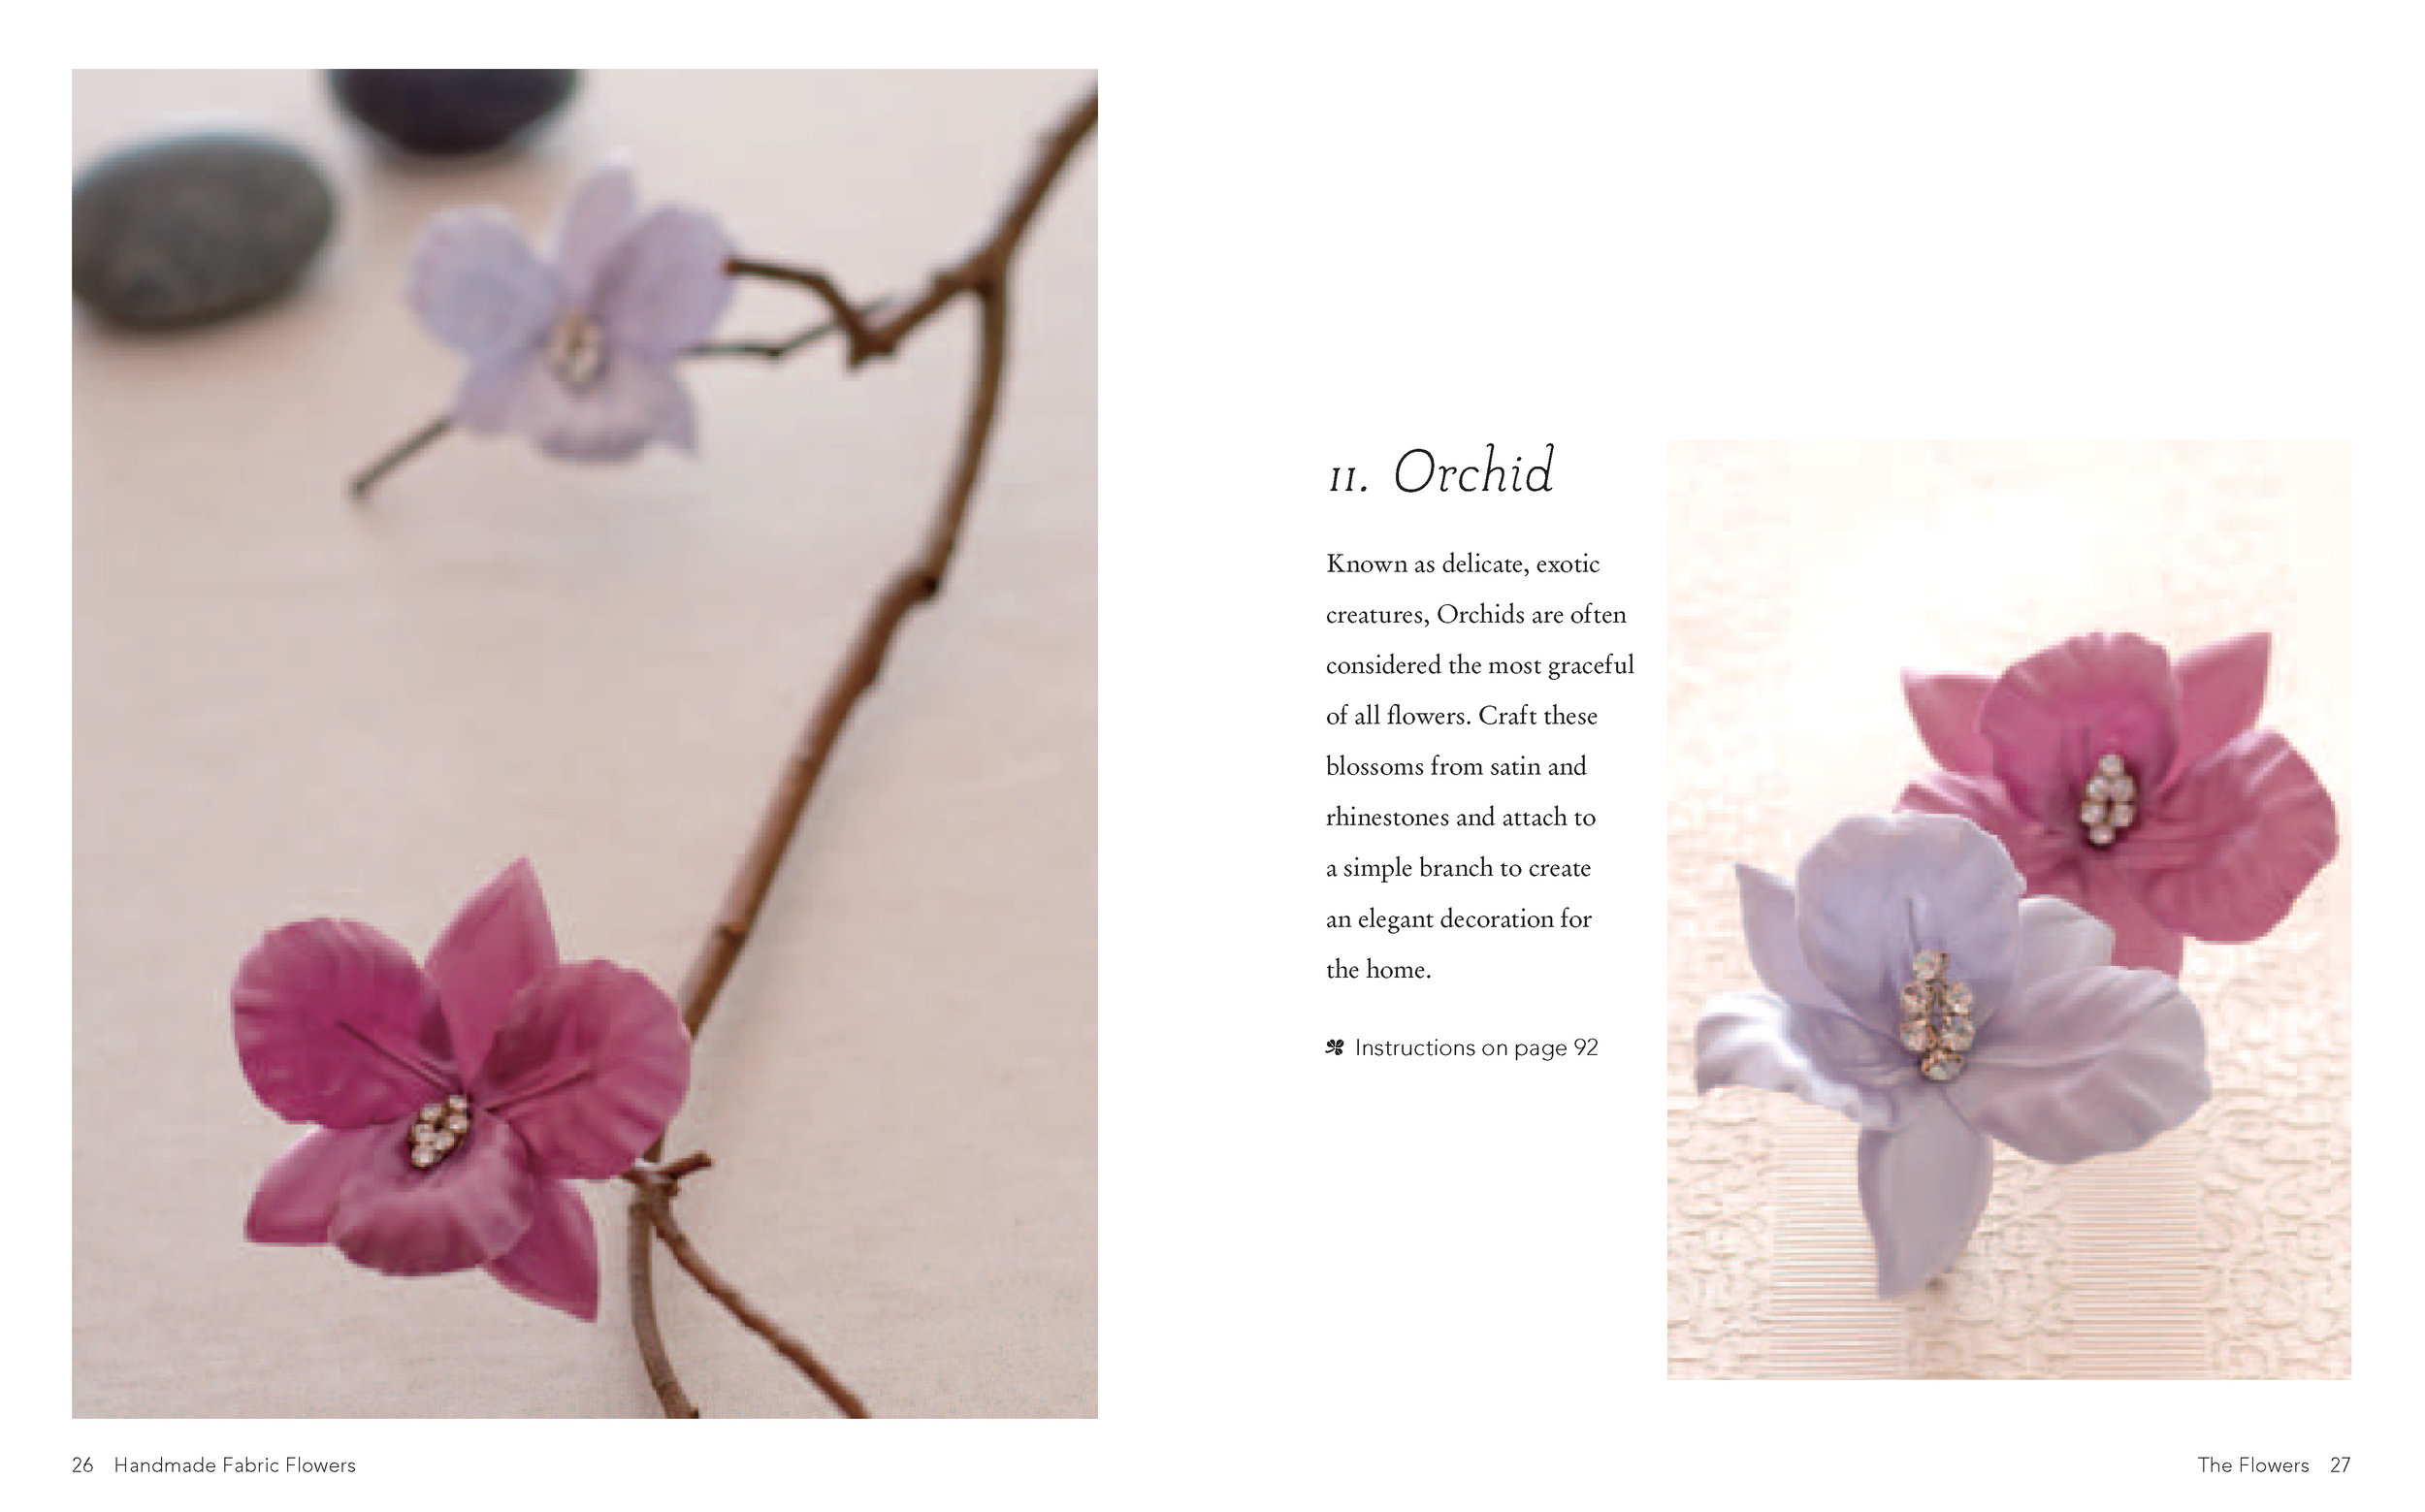 Handmade Fabric Flowers 26.27.jpg